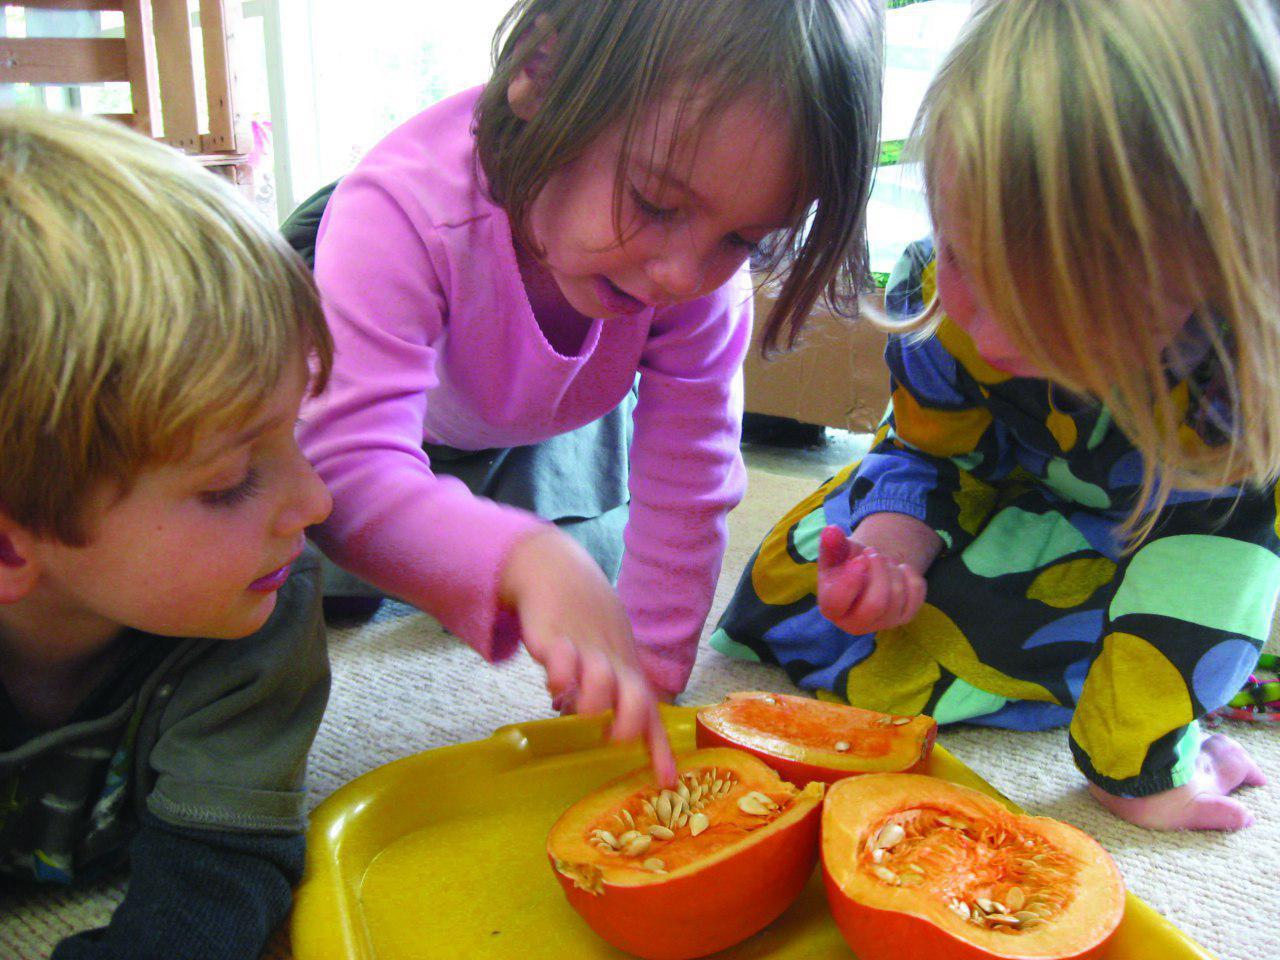 نقش این محیط ها در تقویت مغز کودکان